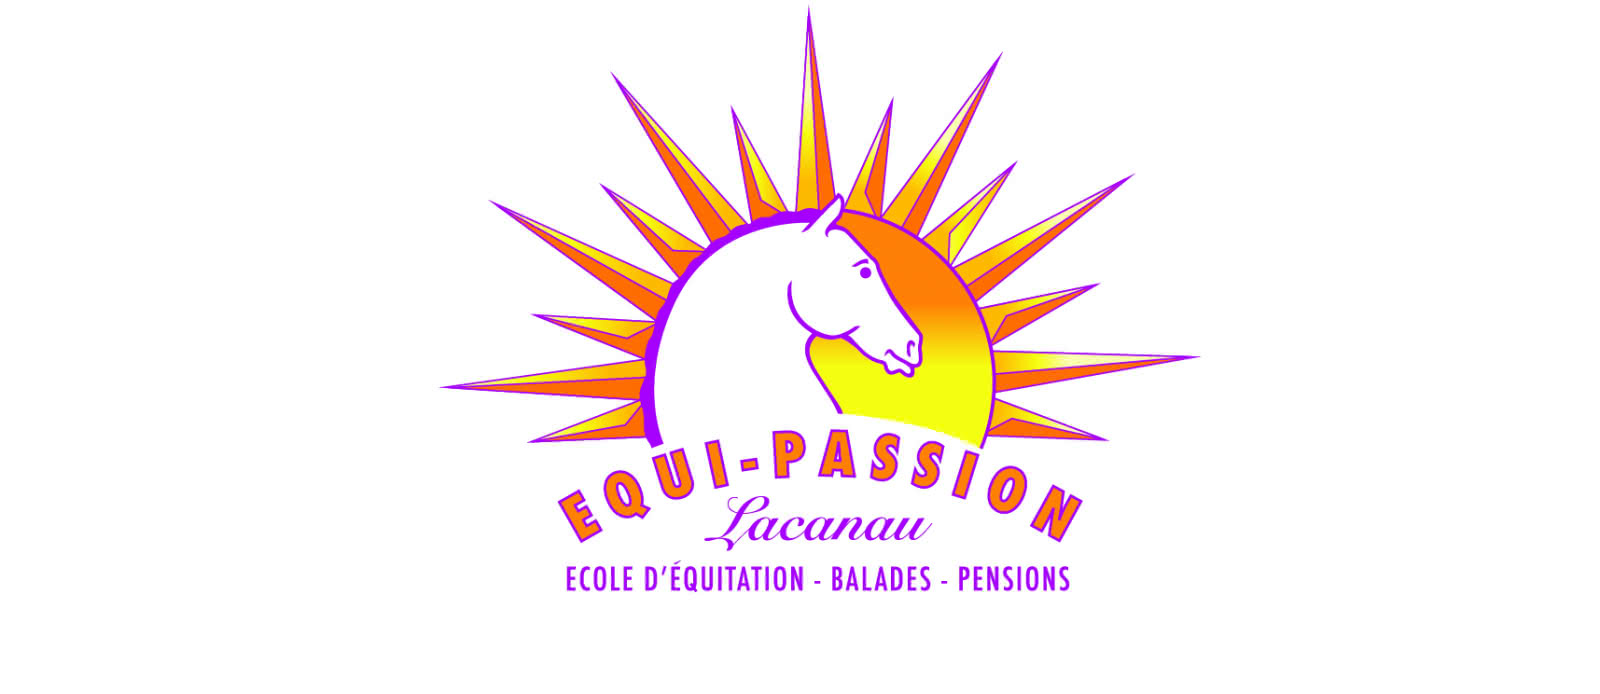 Lacanau Equi-passion